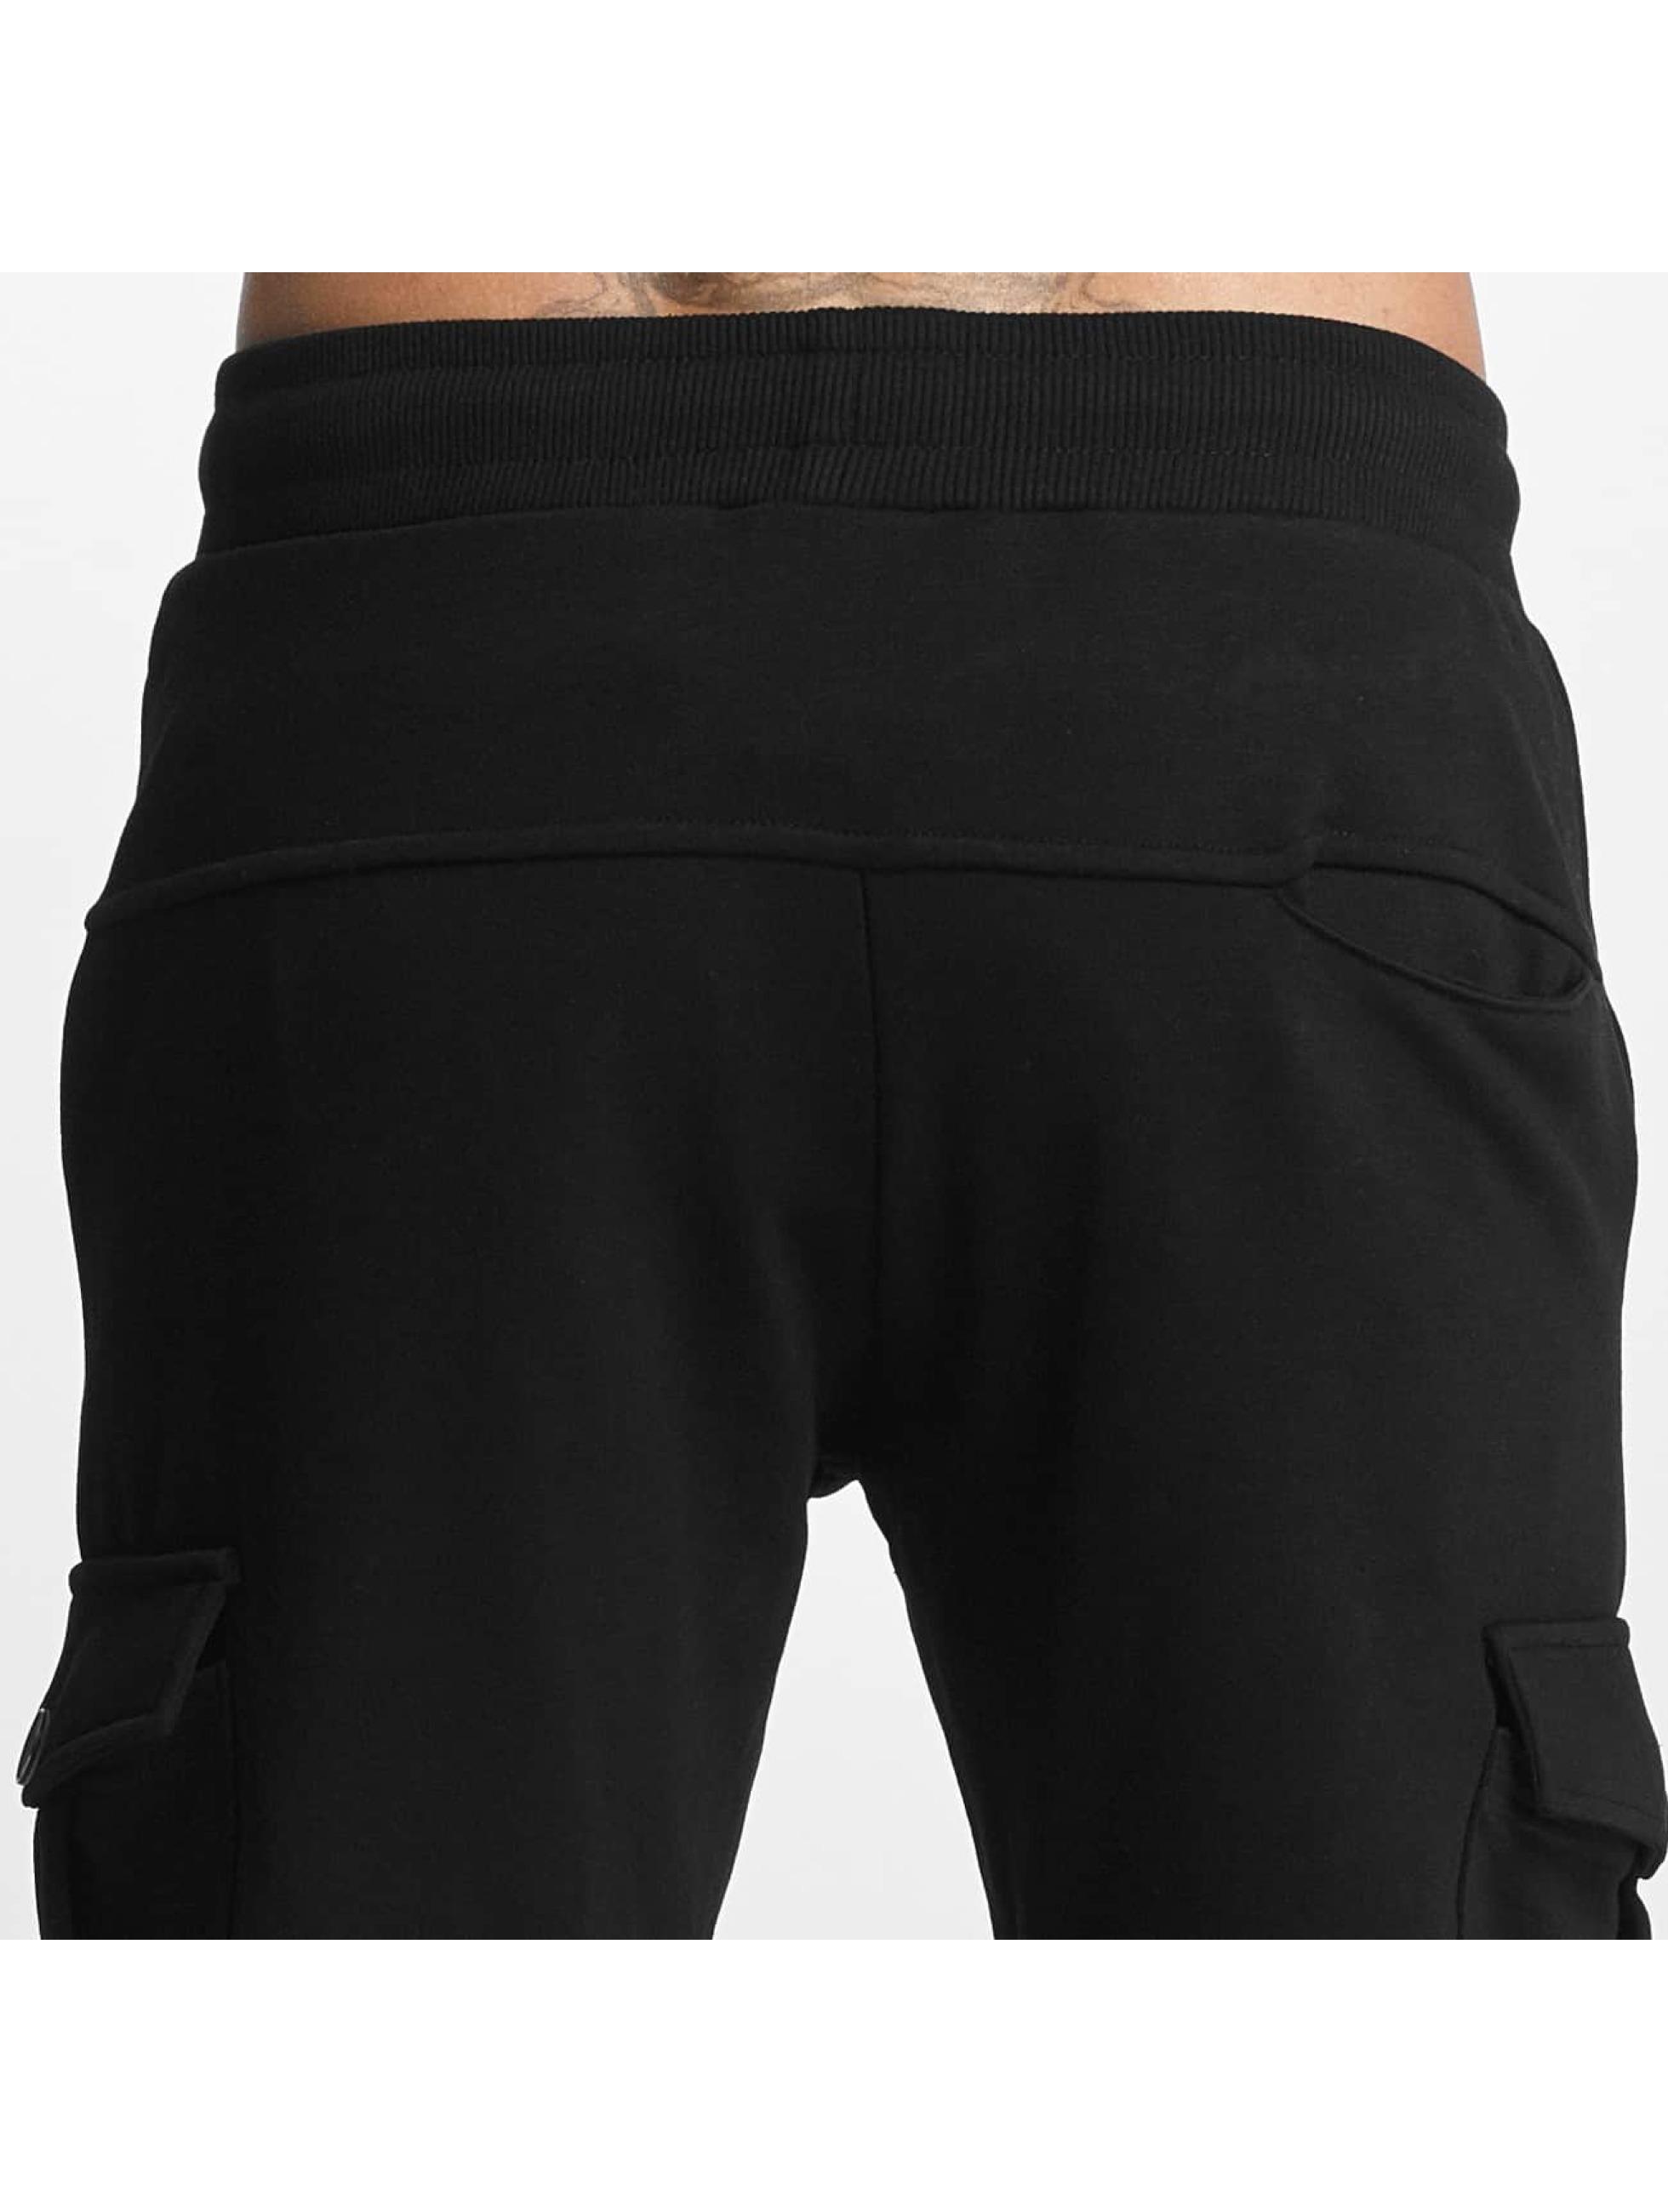 DEF Jogginghose Soft Cargo schwarz